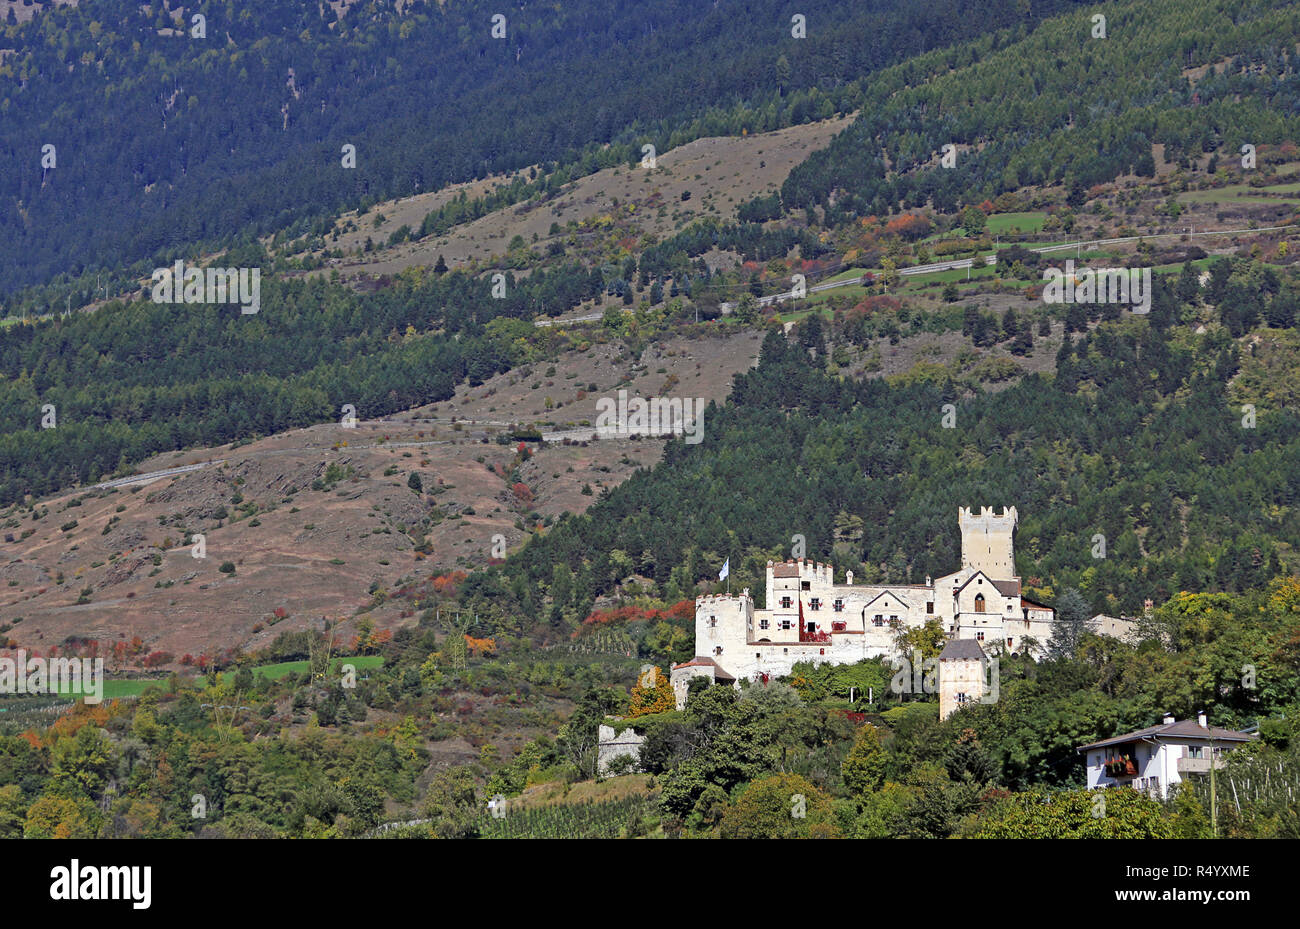 churburg near schlunders in south tyrol Stock Photo